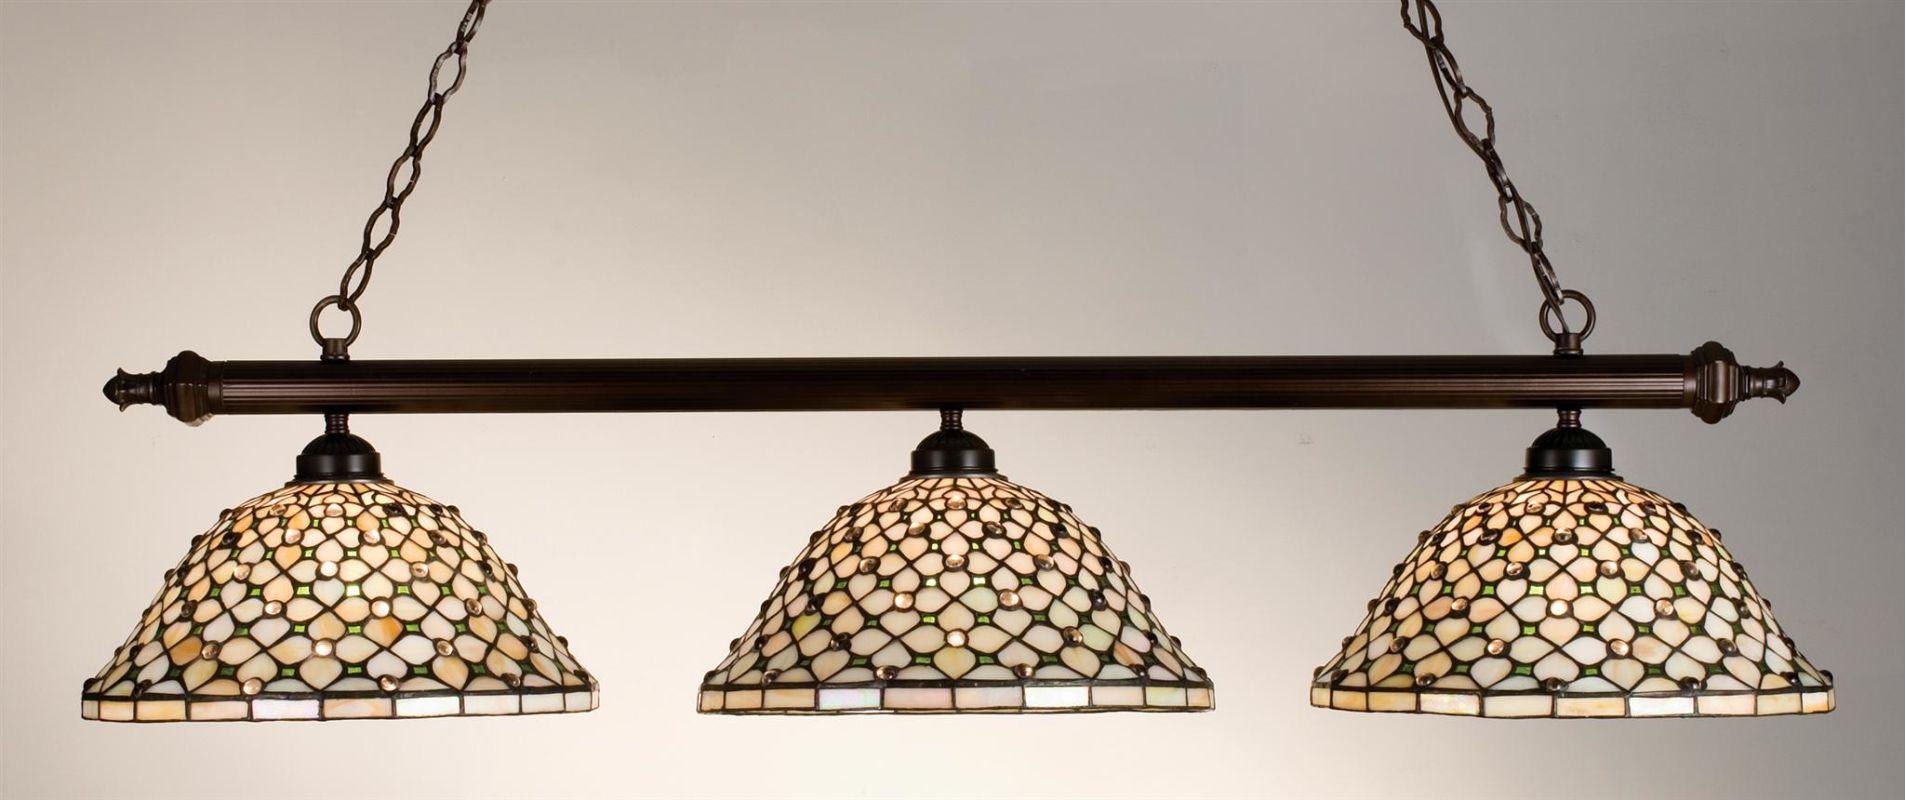 Meyda Tiffany 18848 Stained Glass / Tiffany Island / Billiard Fixture